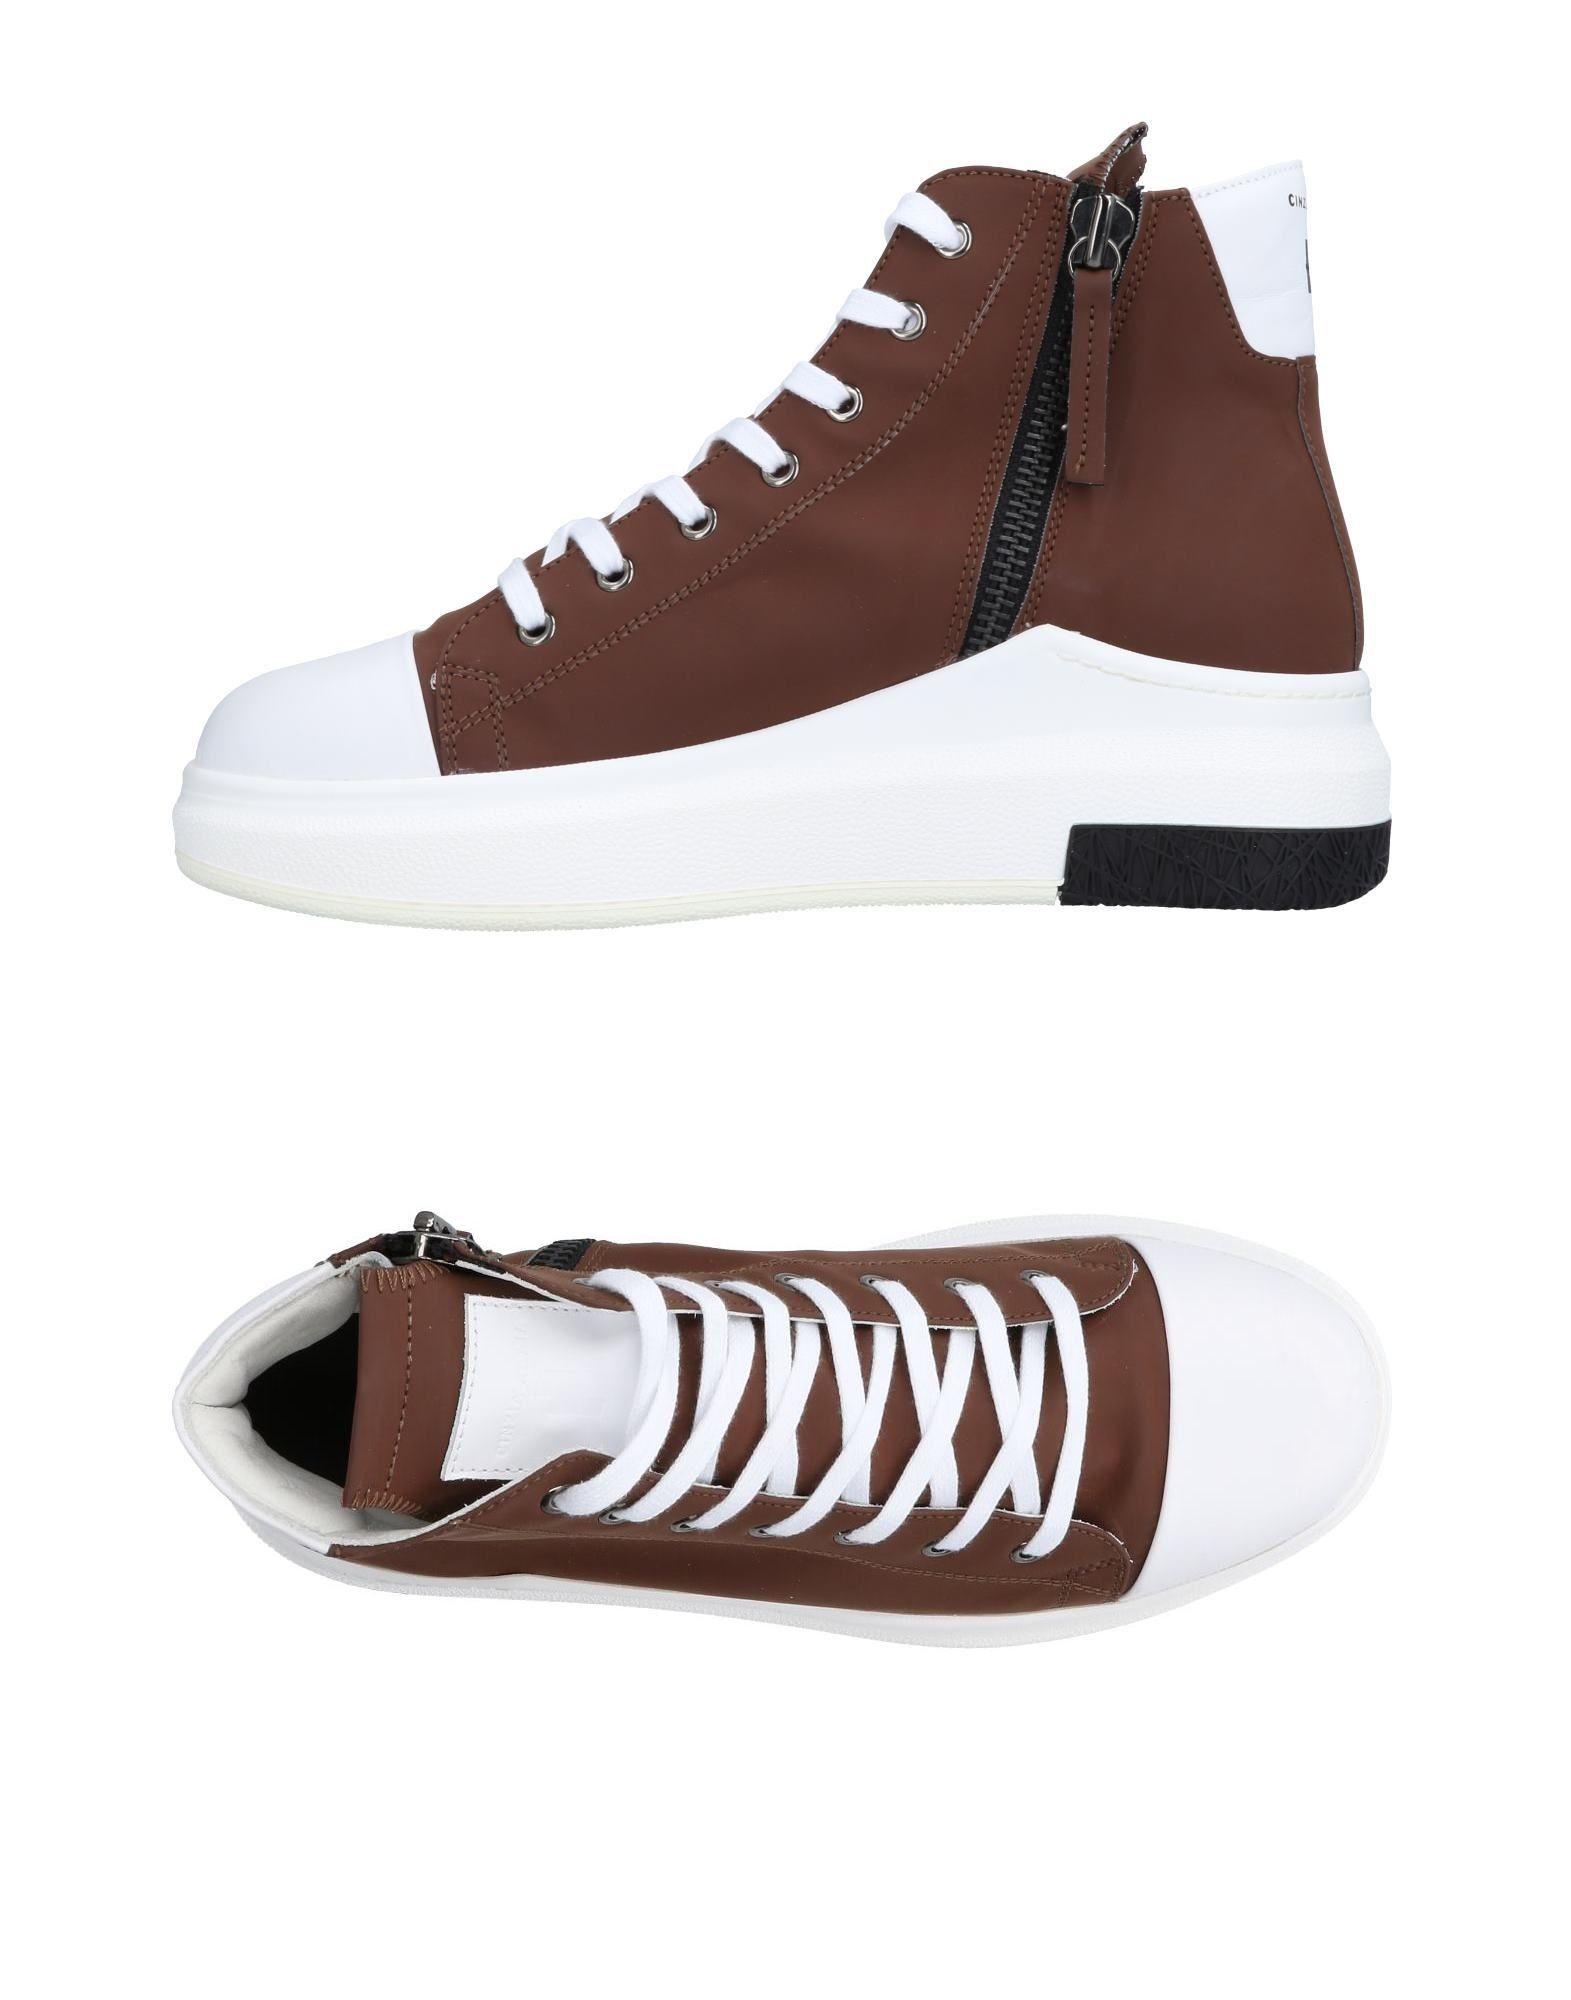 Cinzia Araia Sneakers Herren  11493968BB Gute Qualität beliebte Schuhe